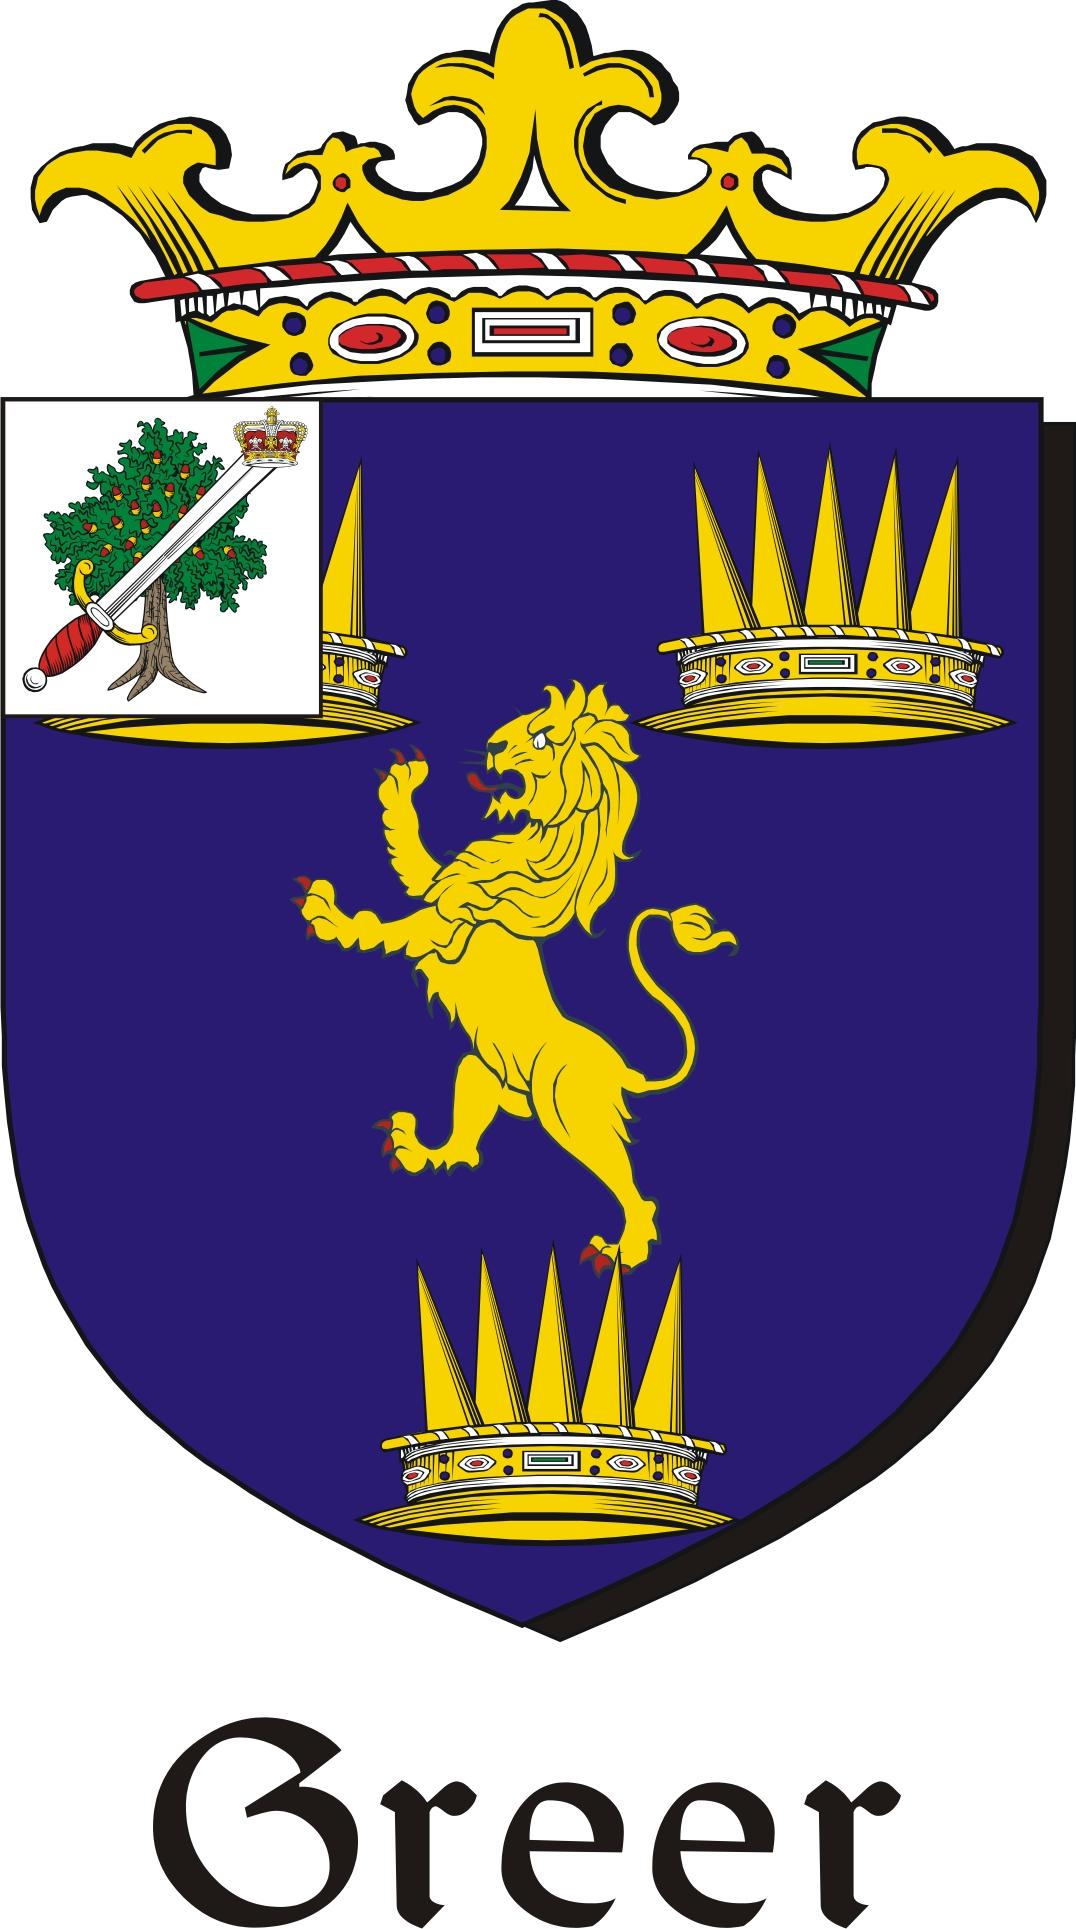 Greer family crest irish coat of arms image download greercoat greer family crest irish coat of arms image download buycottarizona Images